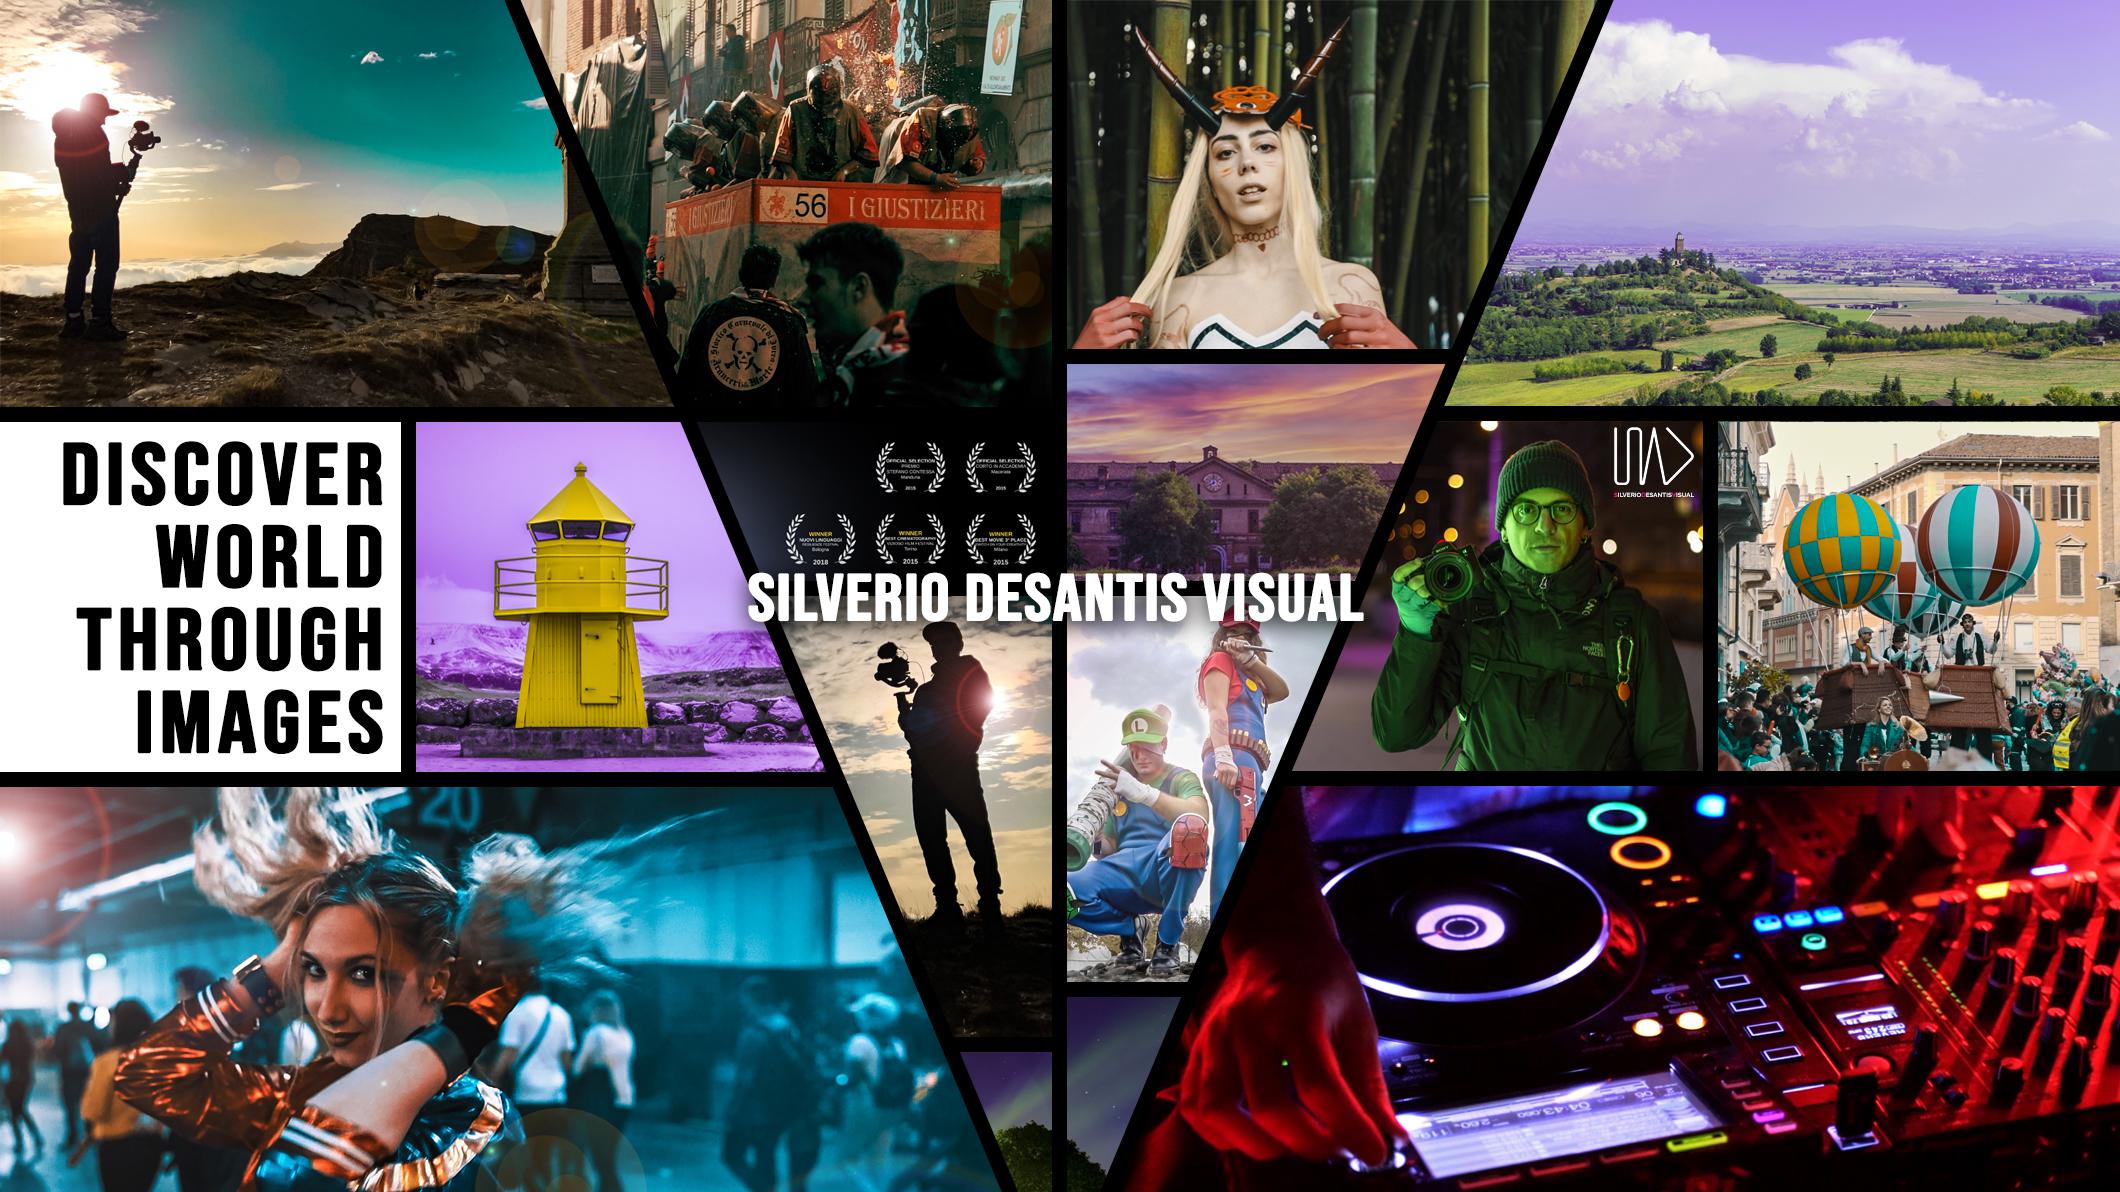 Silverio Desantis Visual